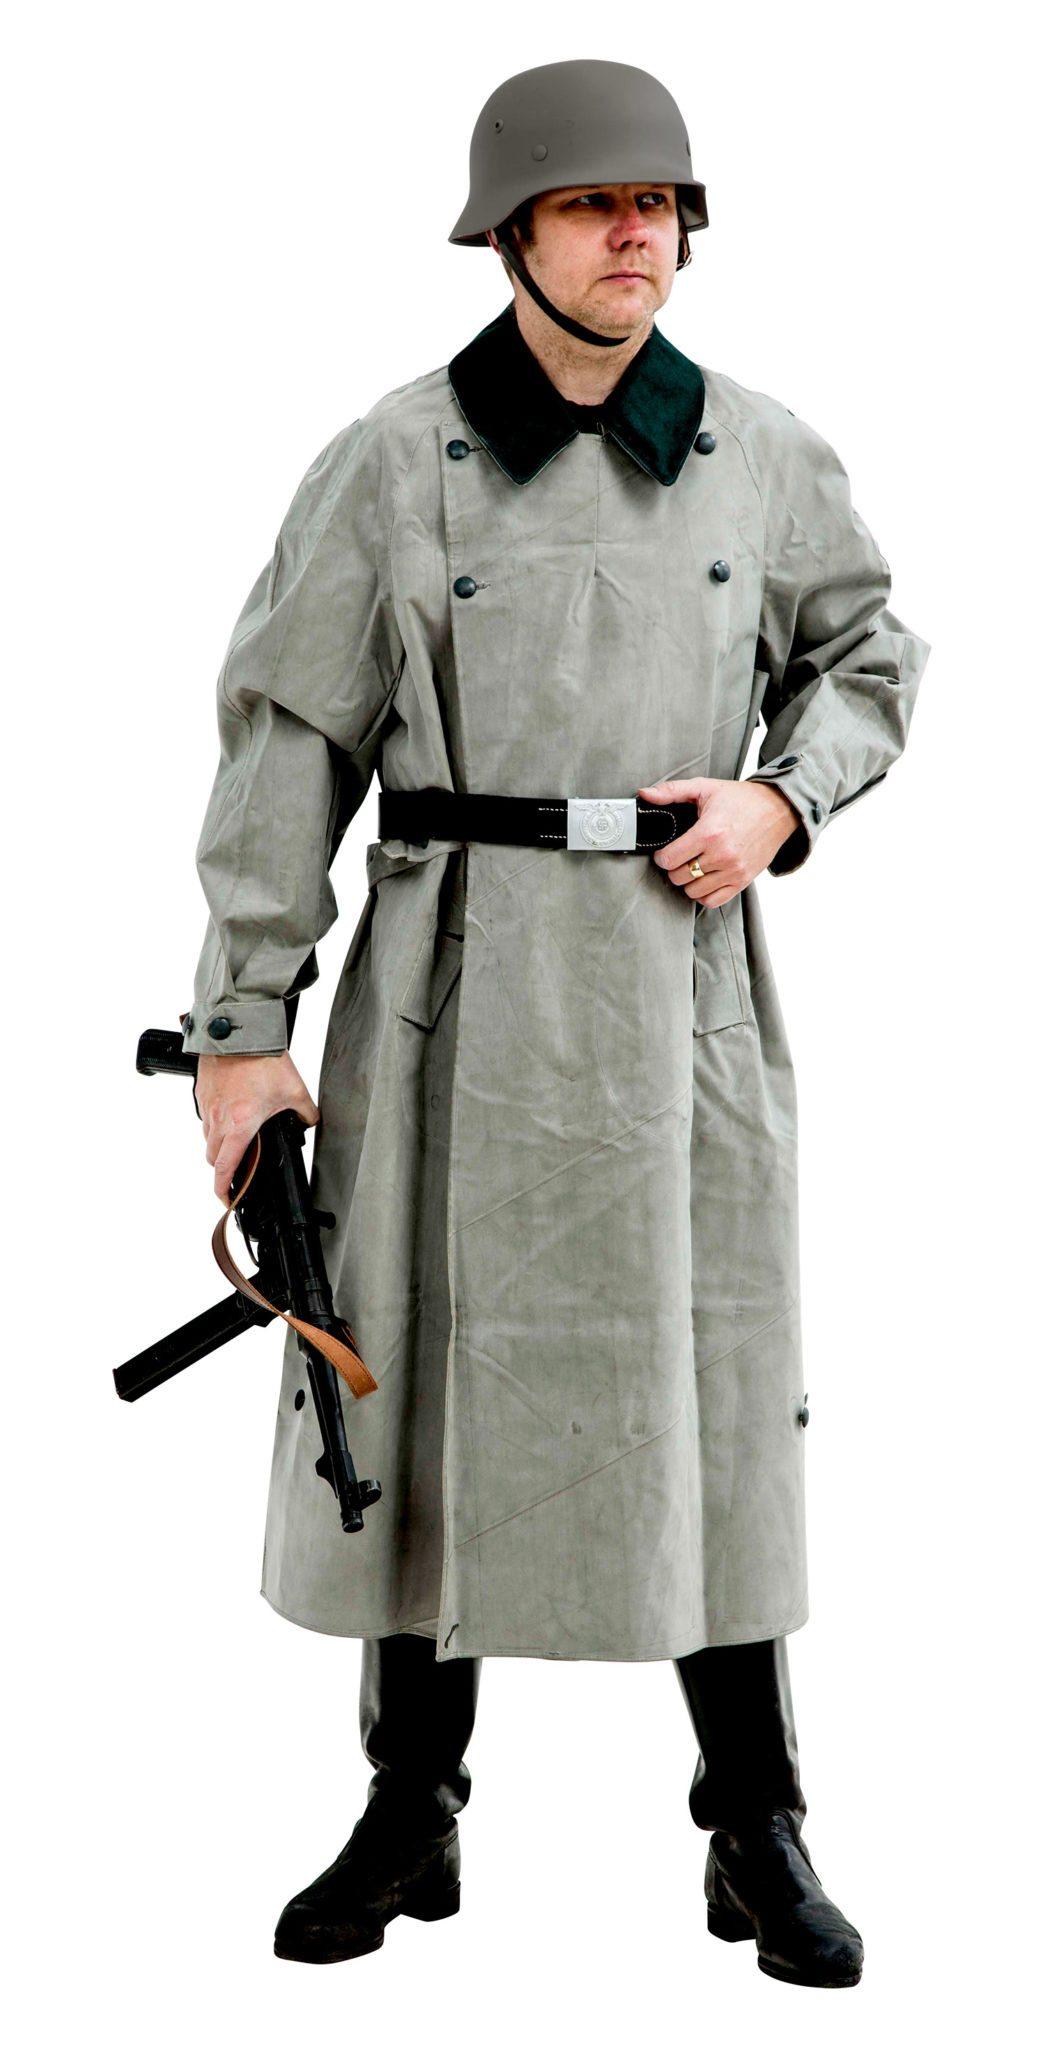 WW2 German Kradmantel Rubber Motorcycle coat